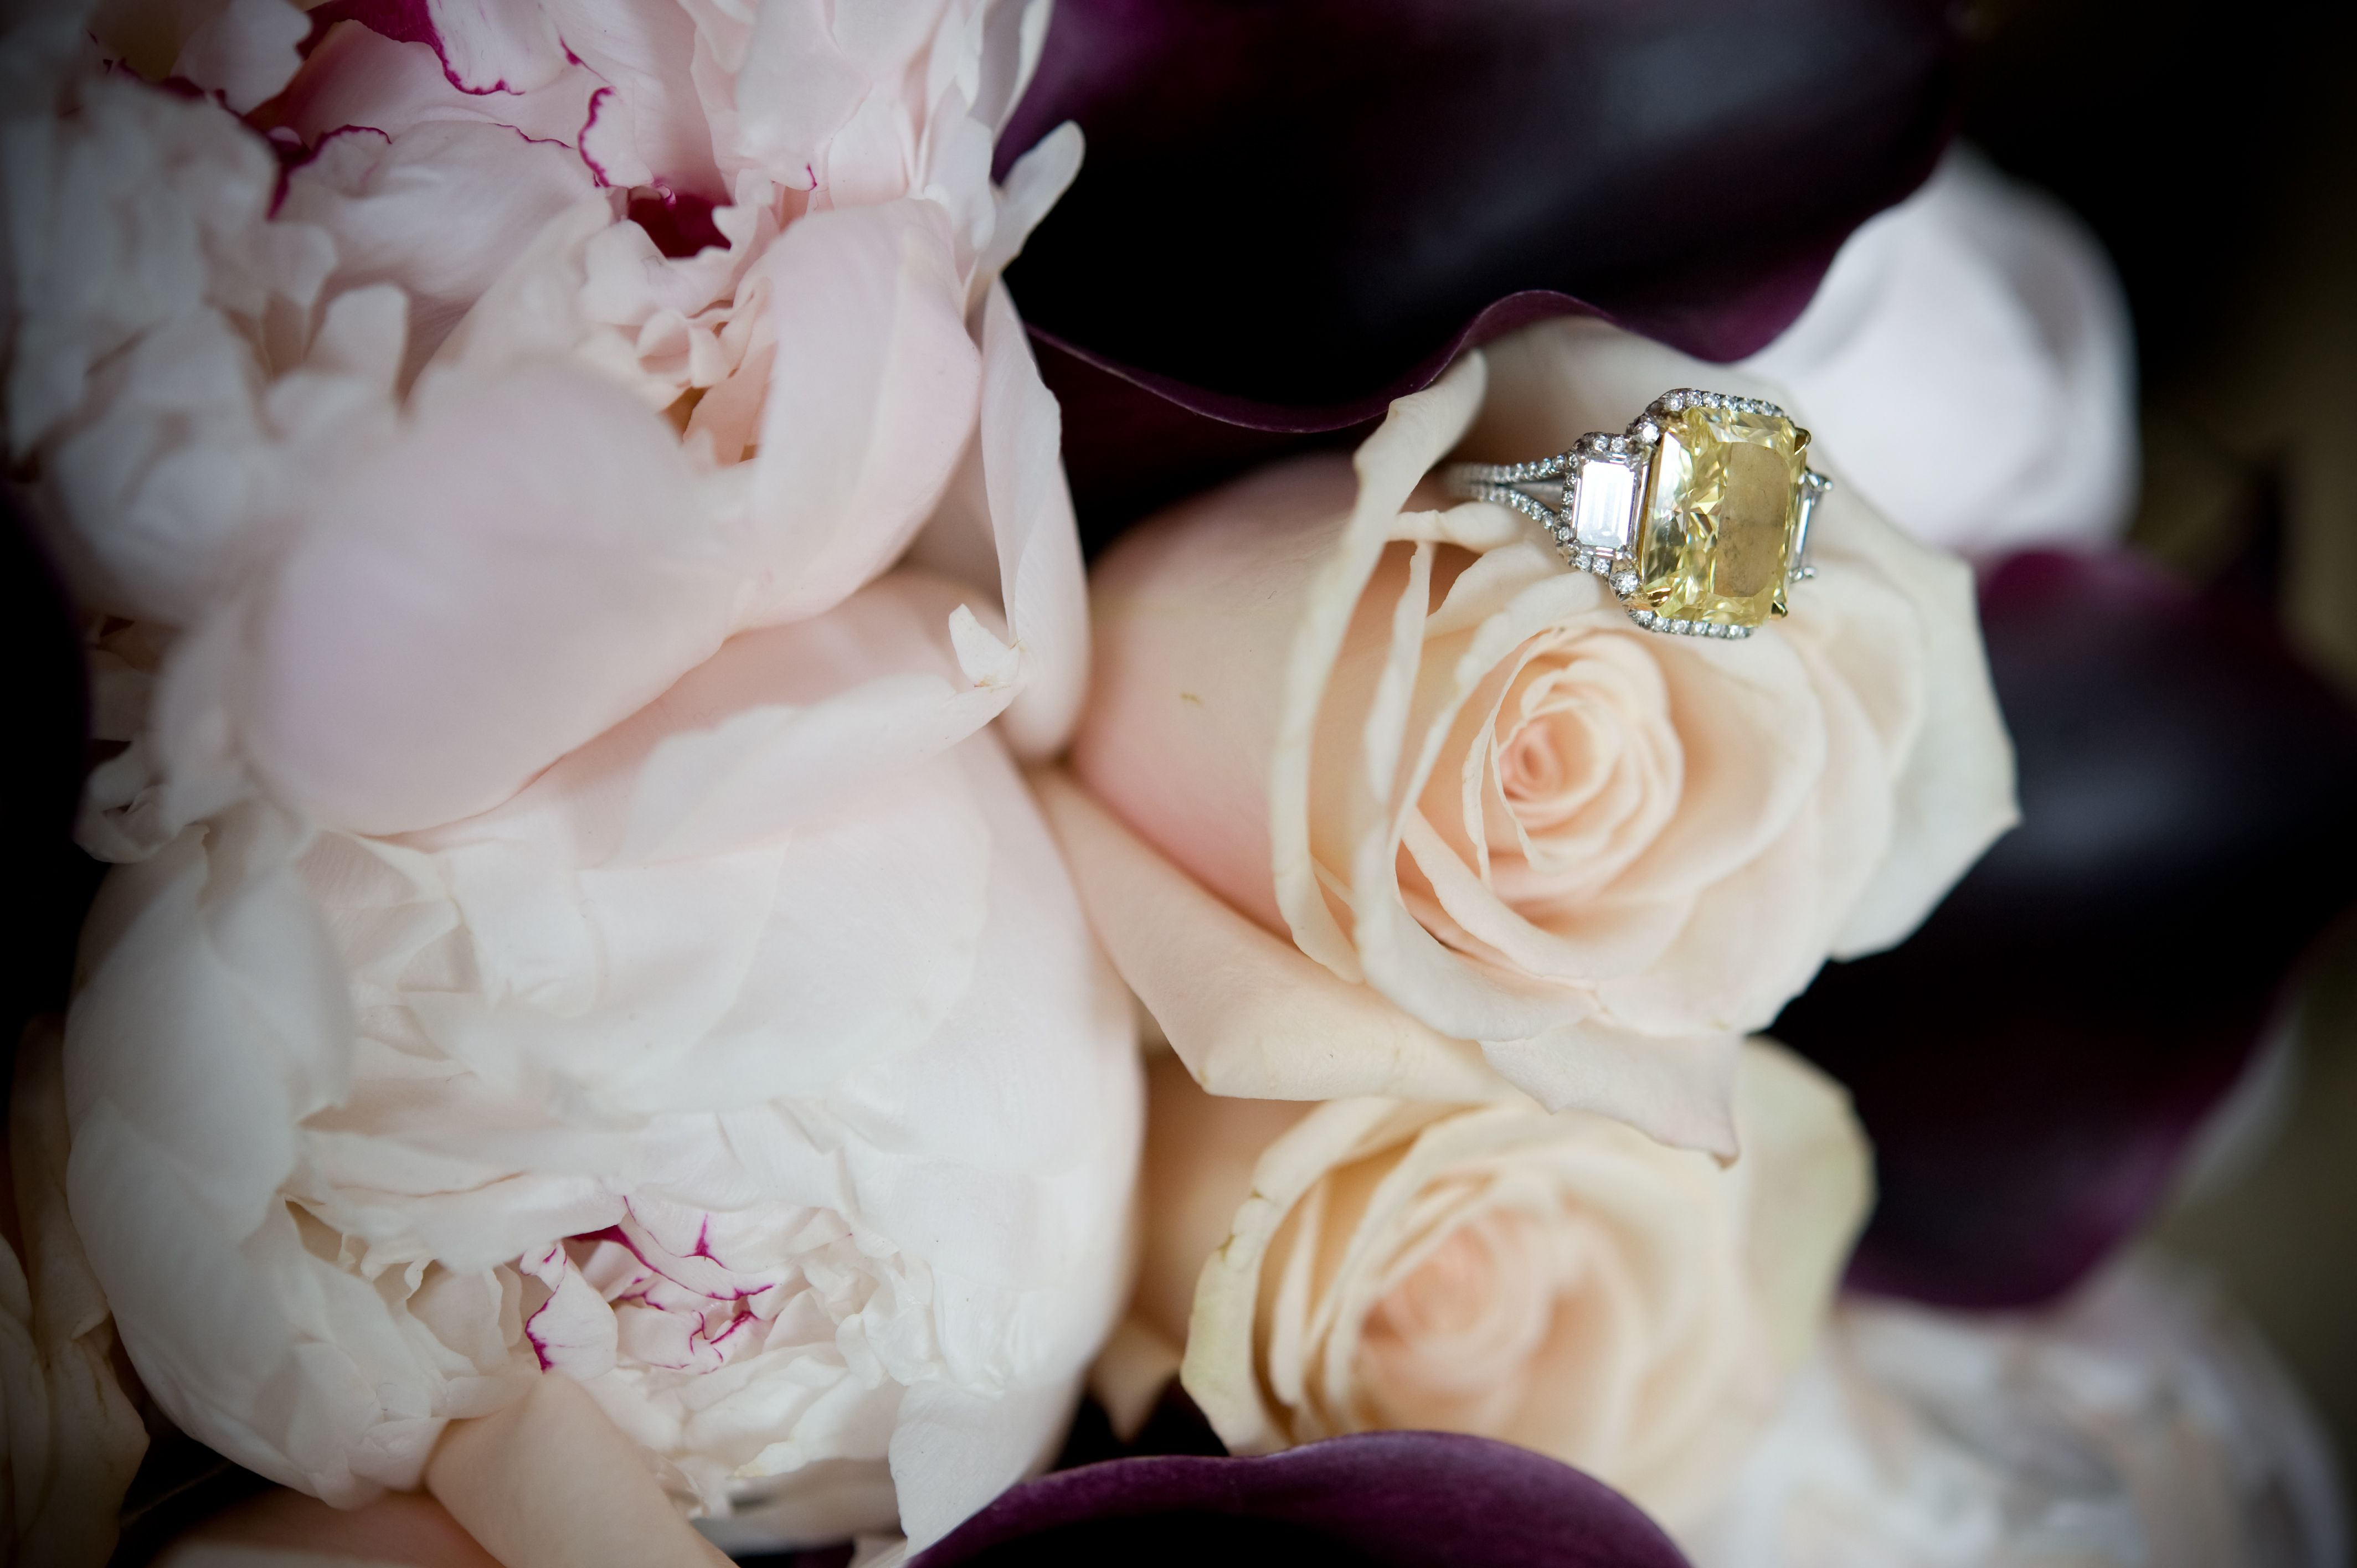 jesse plemons engaged to kirsten dunst engagement ring inspiration yellow diamond side stones